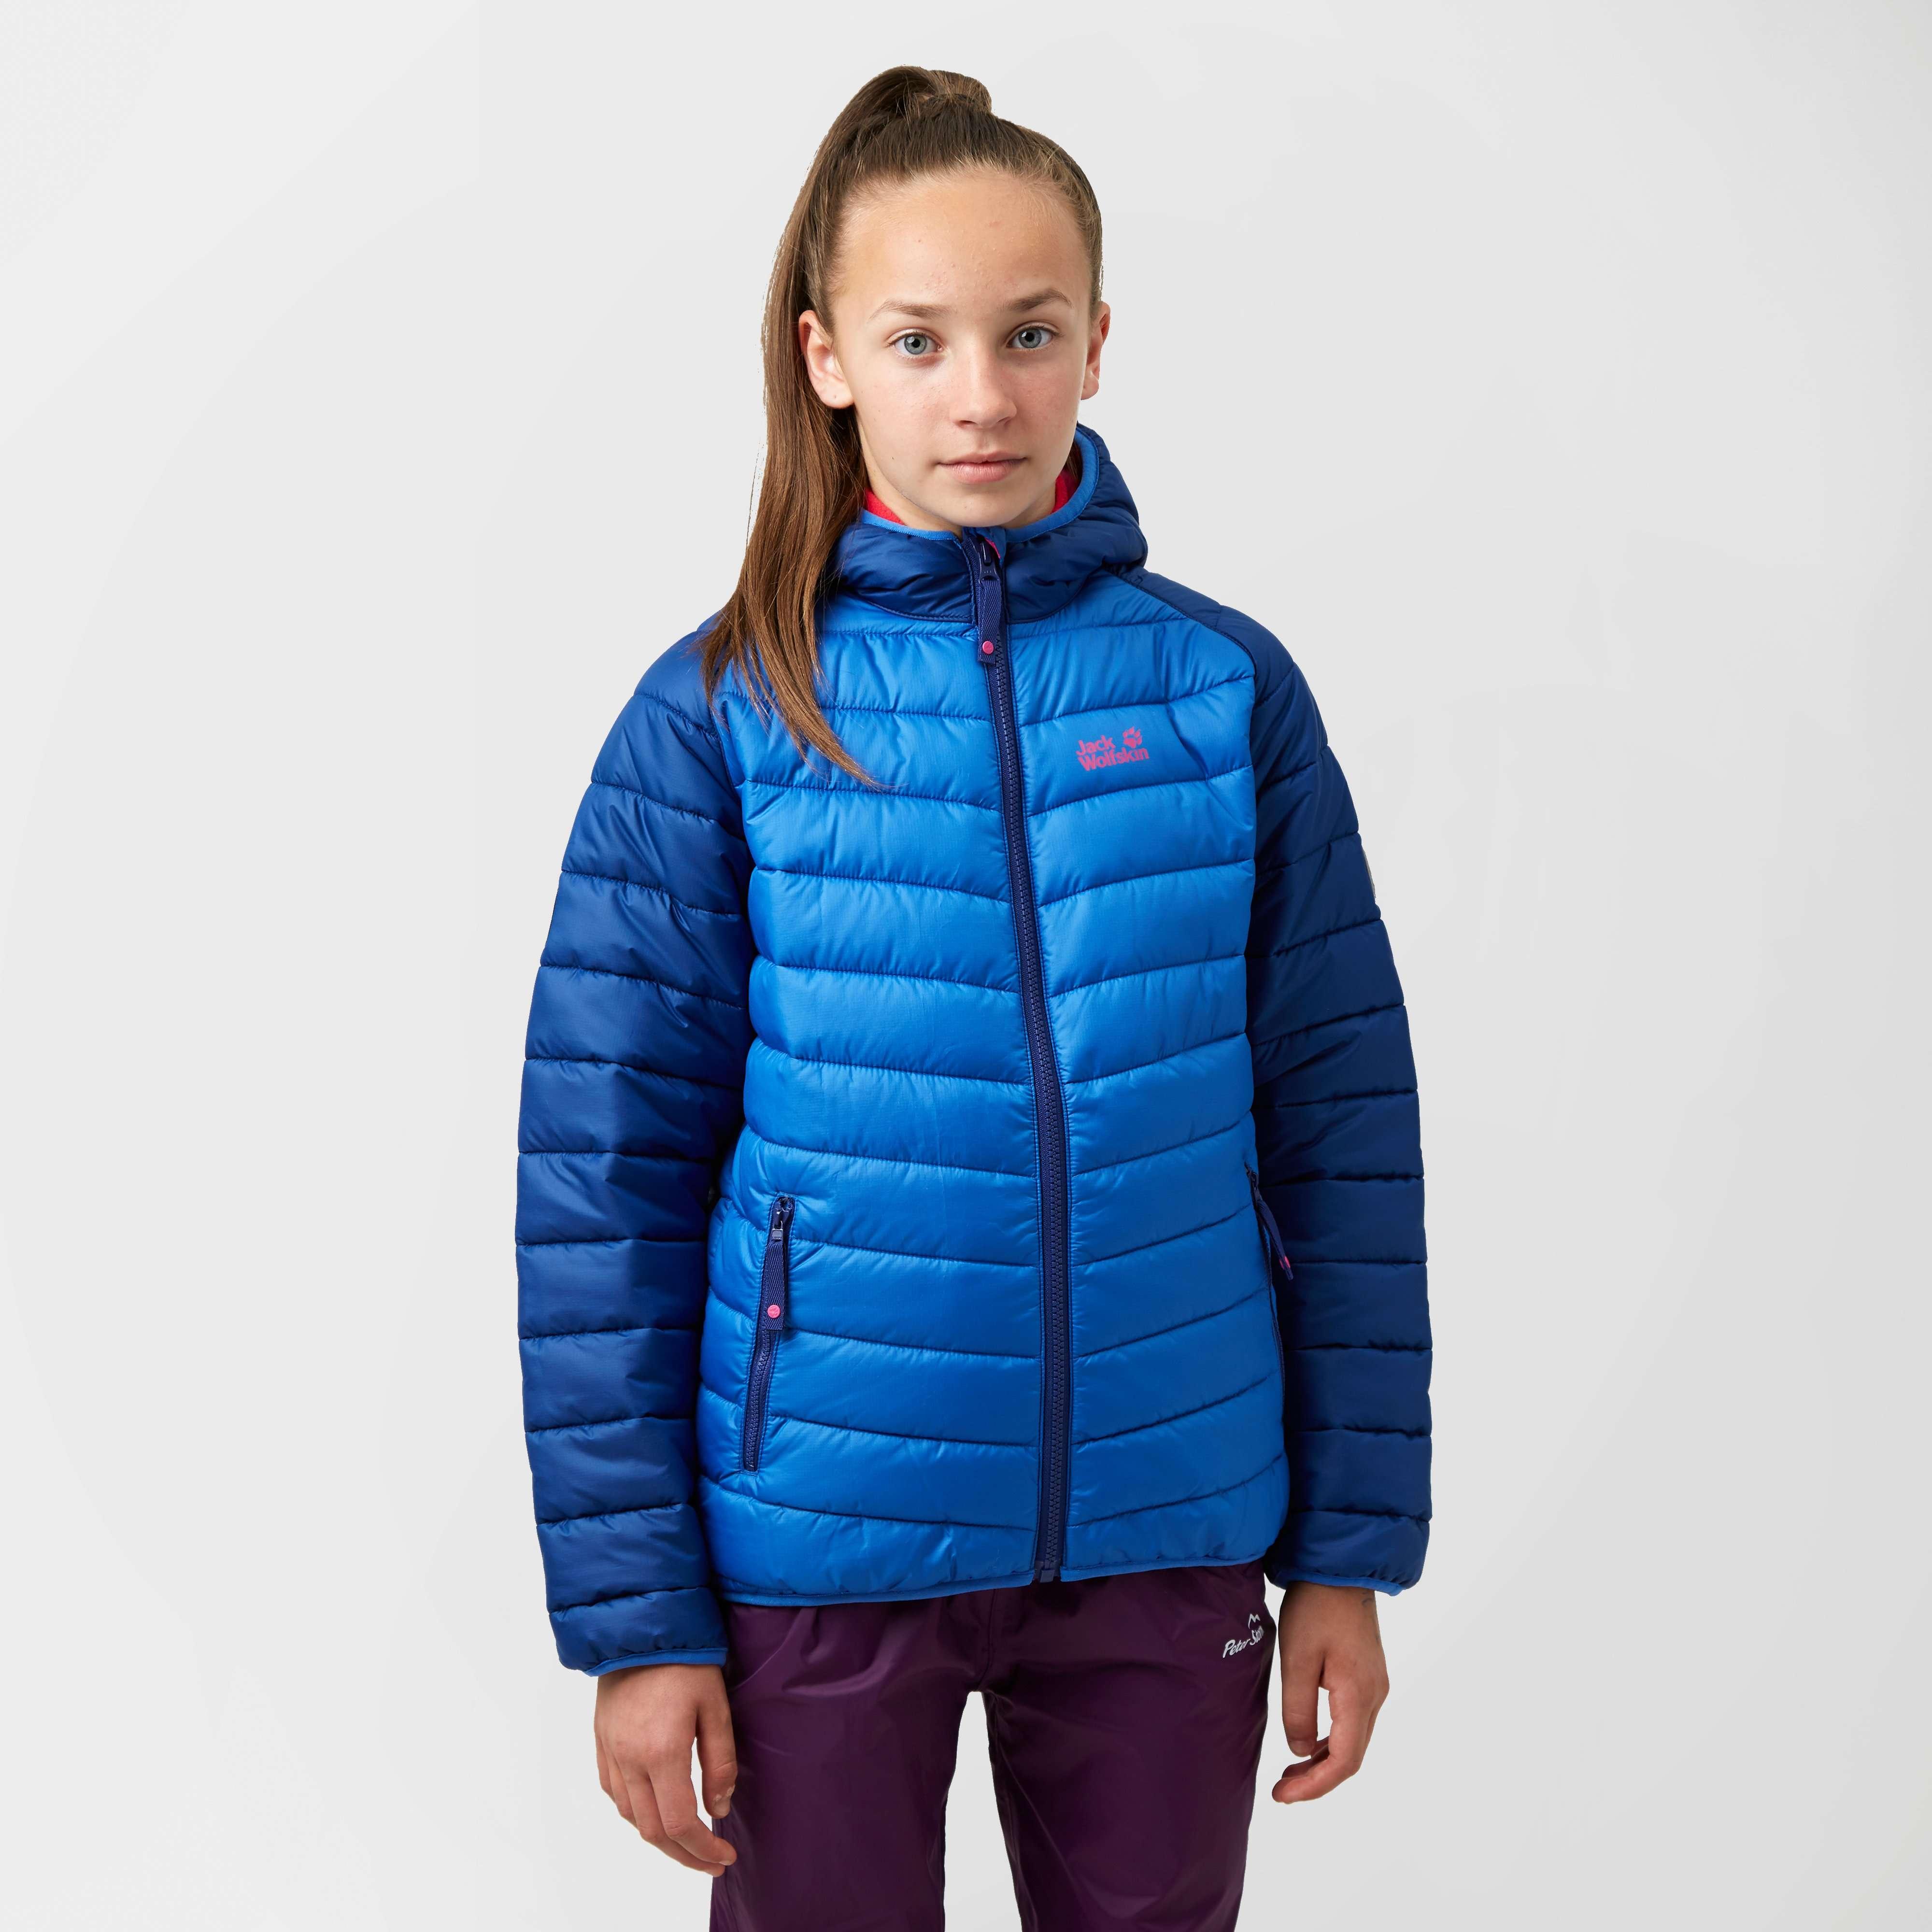 JACK WOLFSKIN Girls Zenon Insulated Hooded Jacket